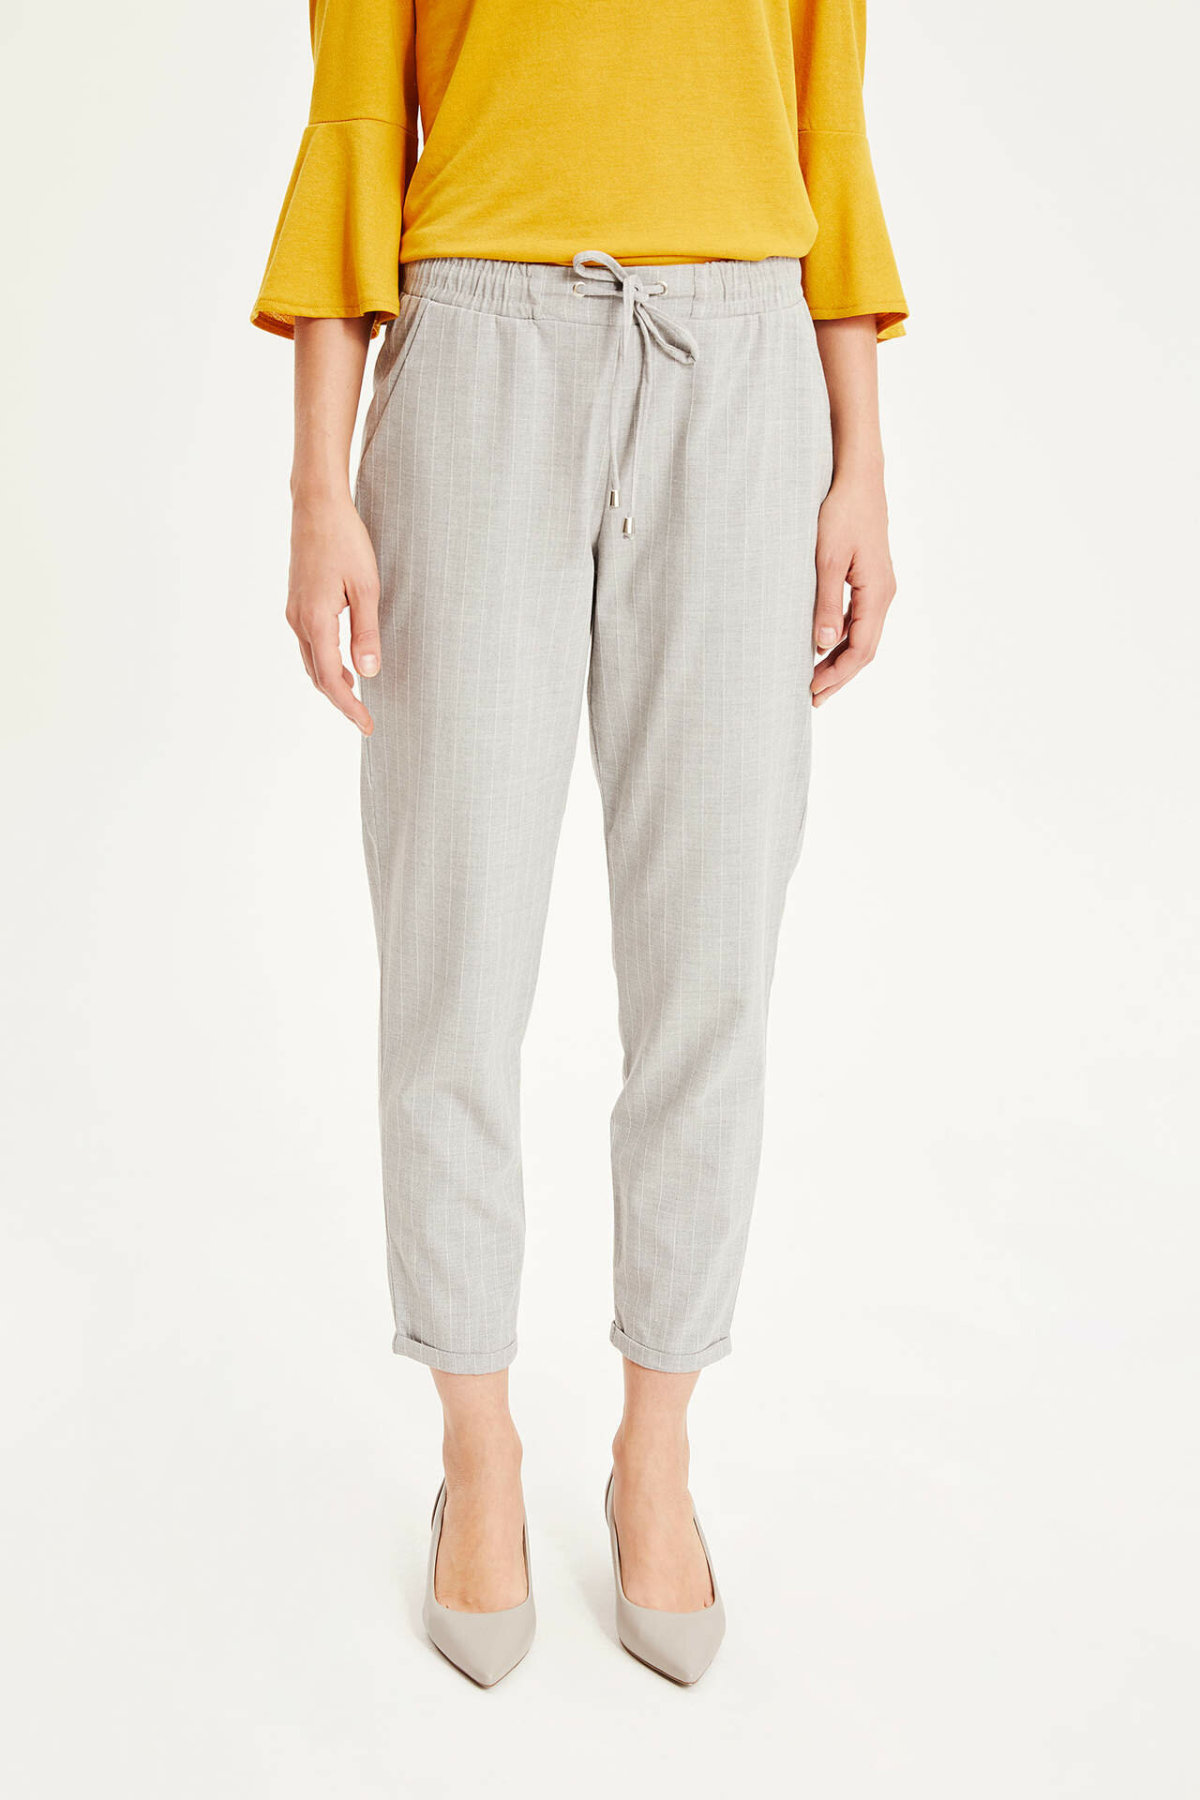 DeFacto Fashion Ladies Plaid Trousers Women Spring Autumn Long Pants Casual Pants Loose Drawstring Office Trousers I4364AZ19SP